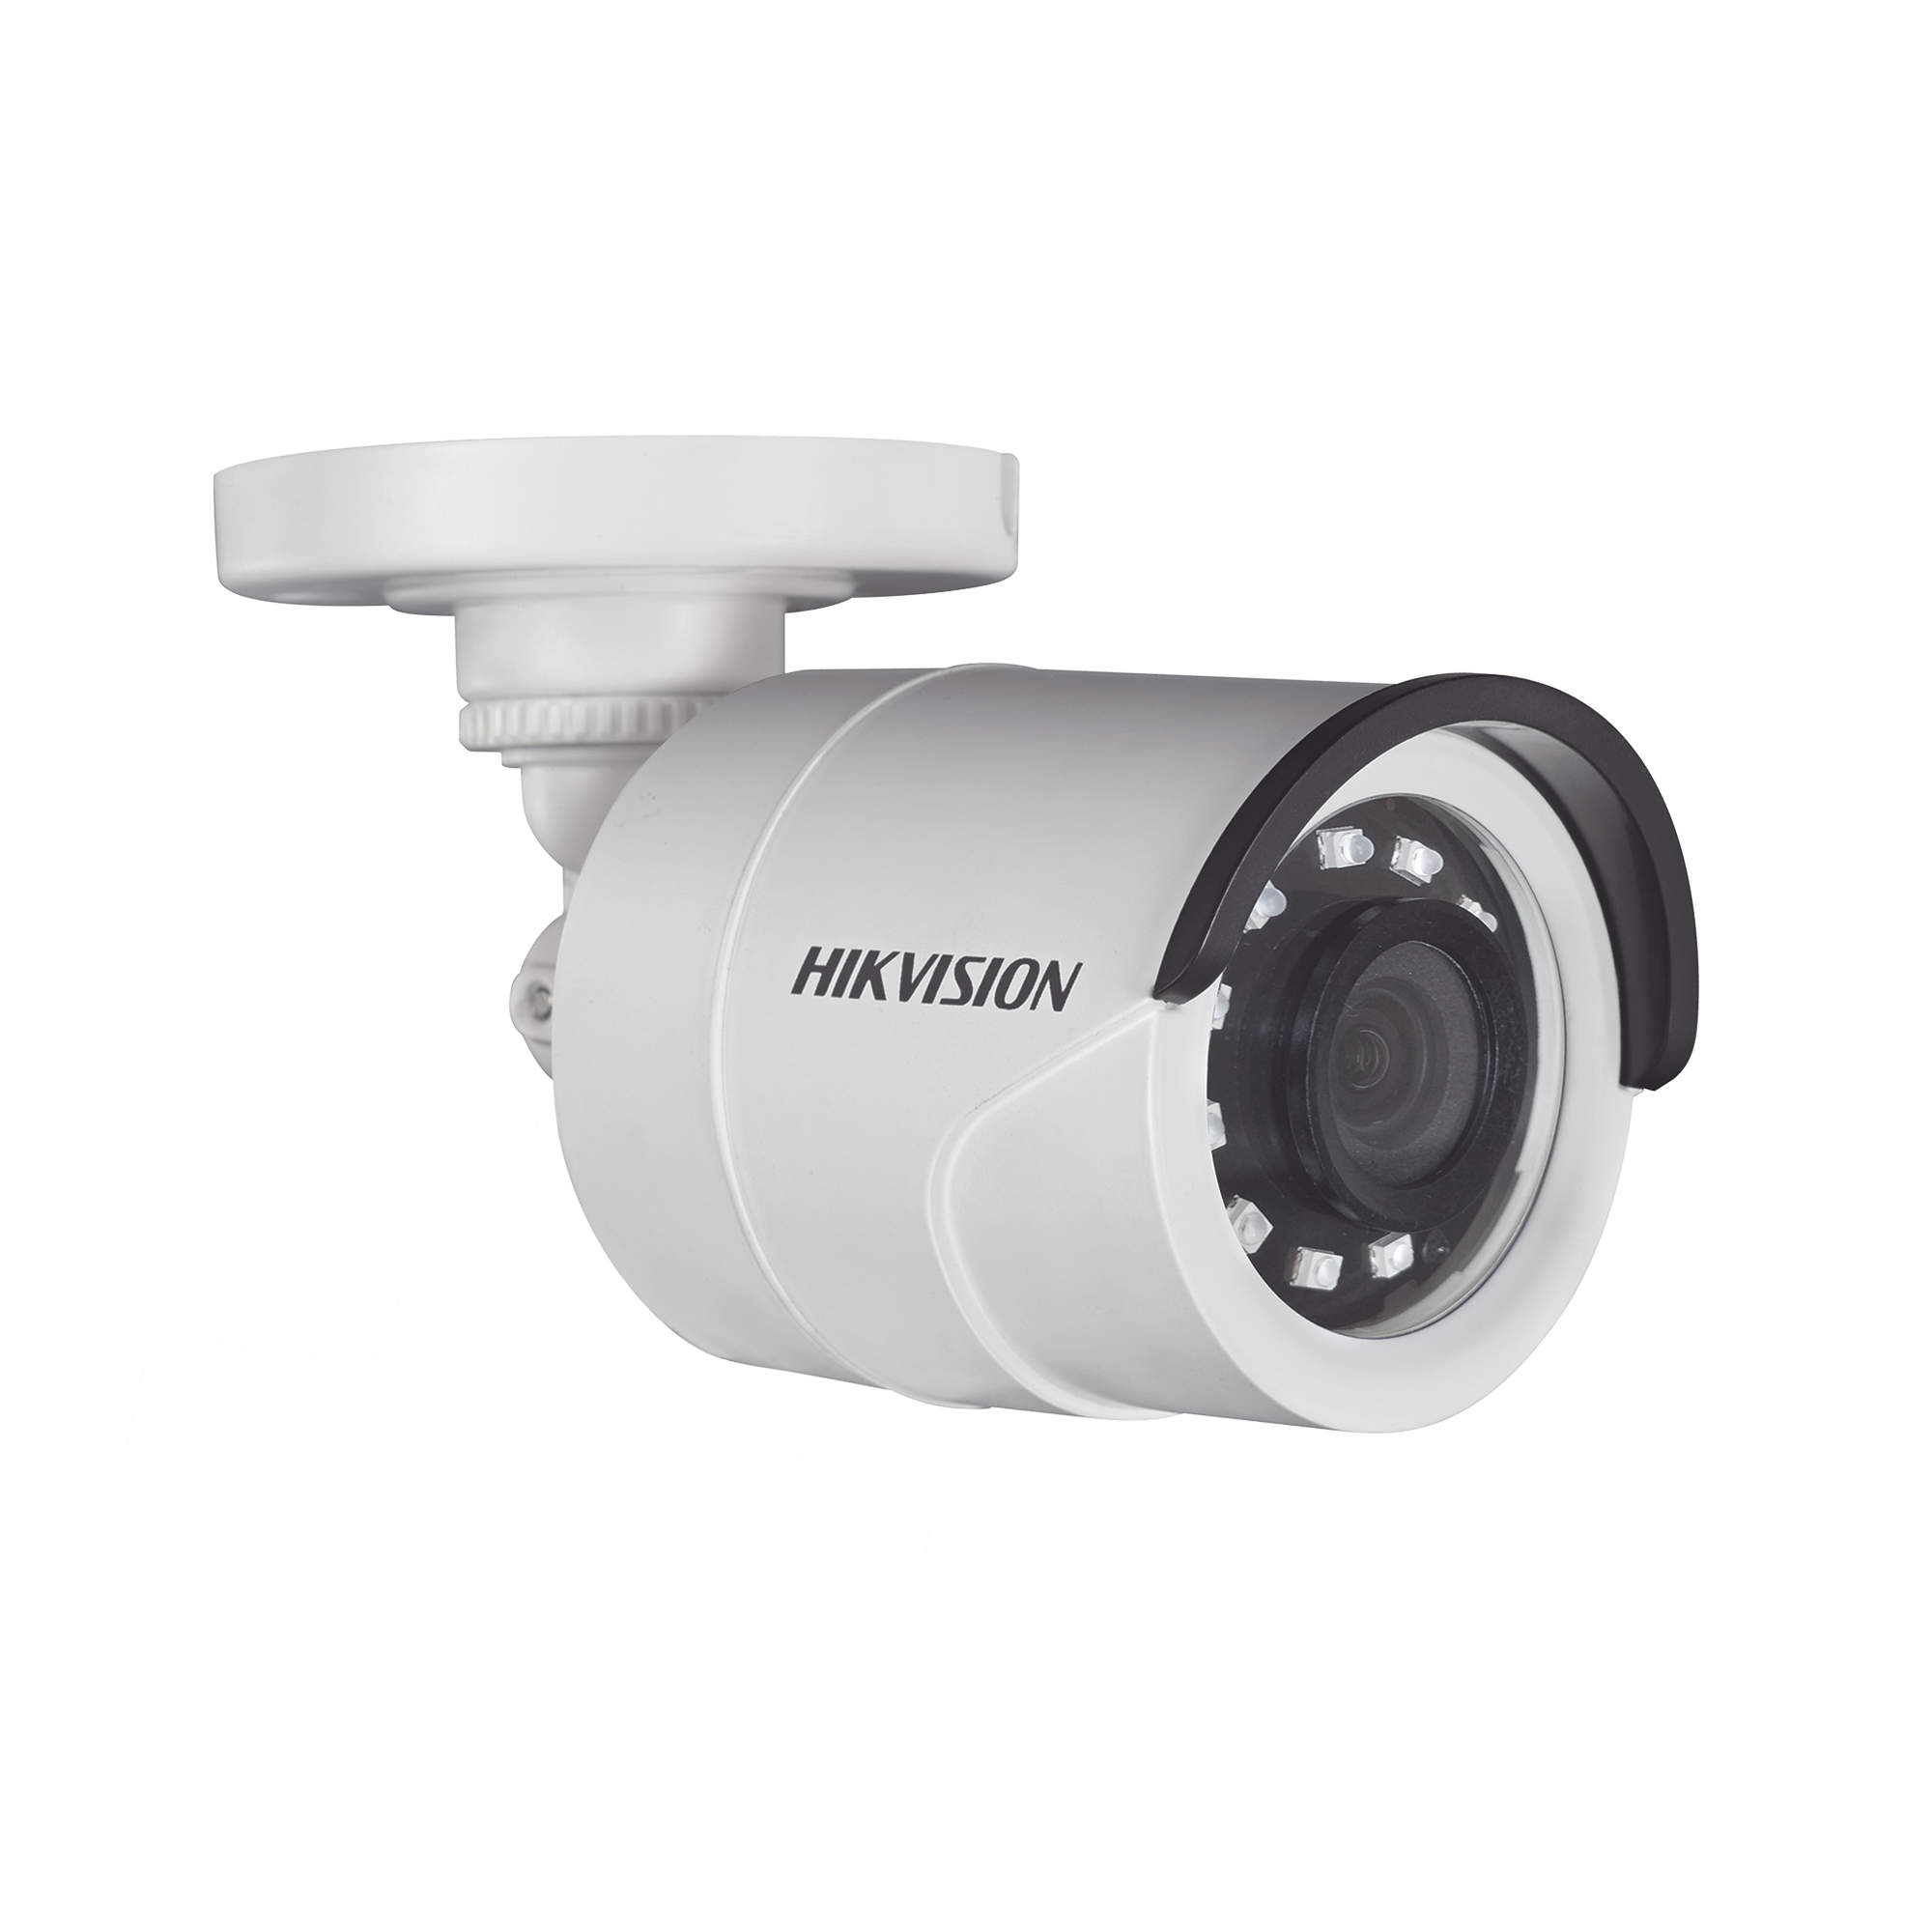 Bala TURBO 1080p / Gran Angular 106? / Lente 2.8 mm / 20 mts Smart IR / Exterior IP66 / 4 Tecnologías (TVI / AHD / CVI / CVBS)